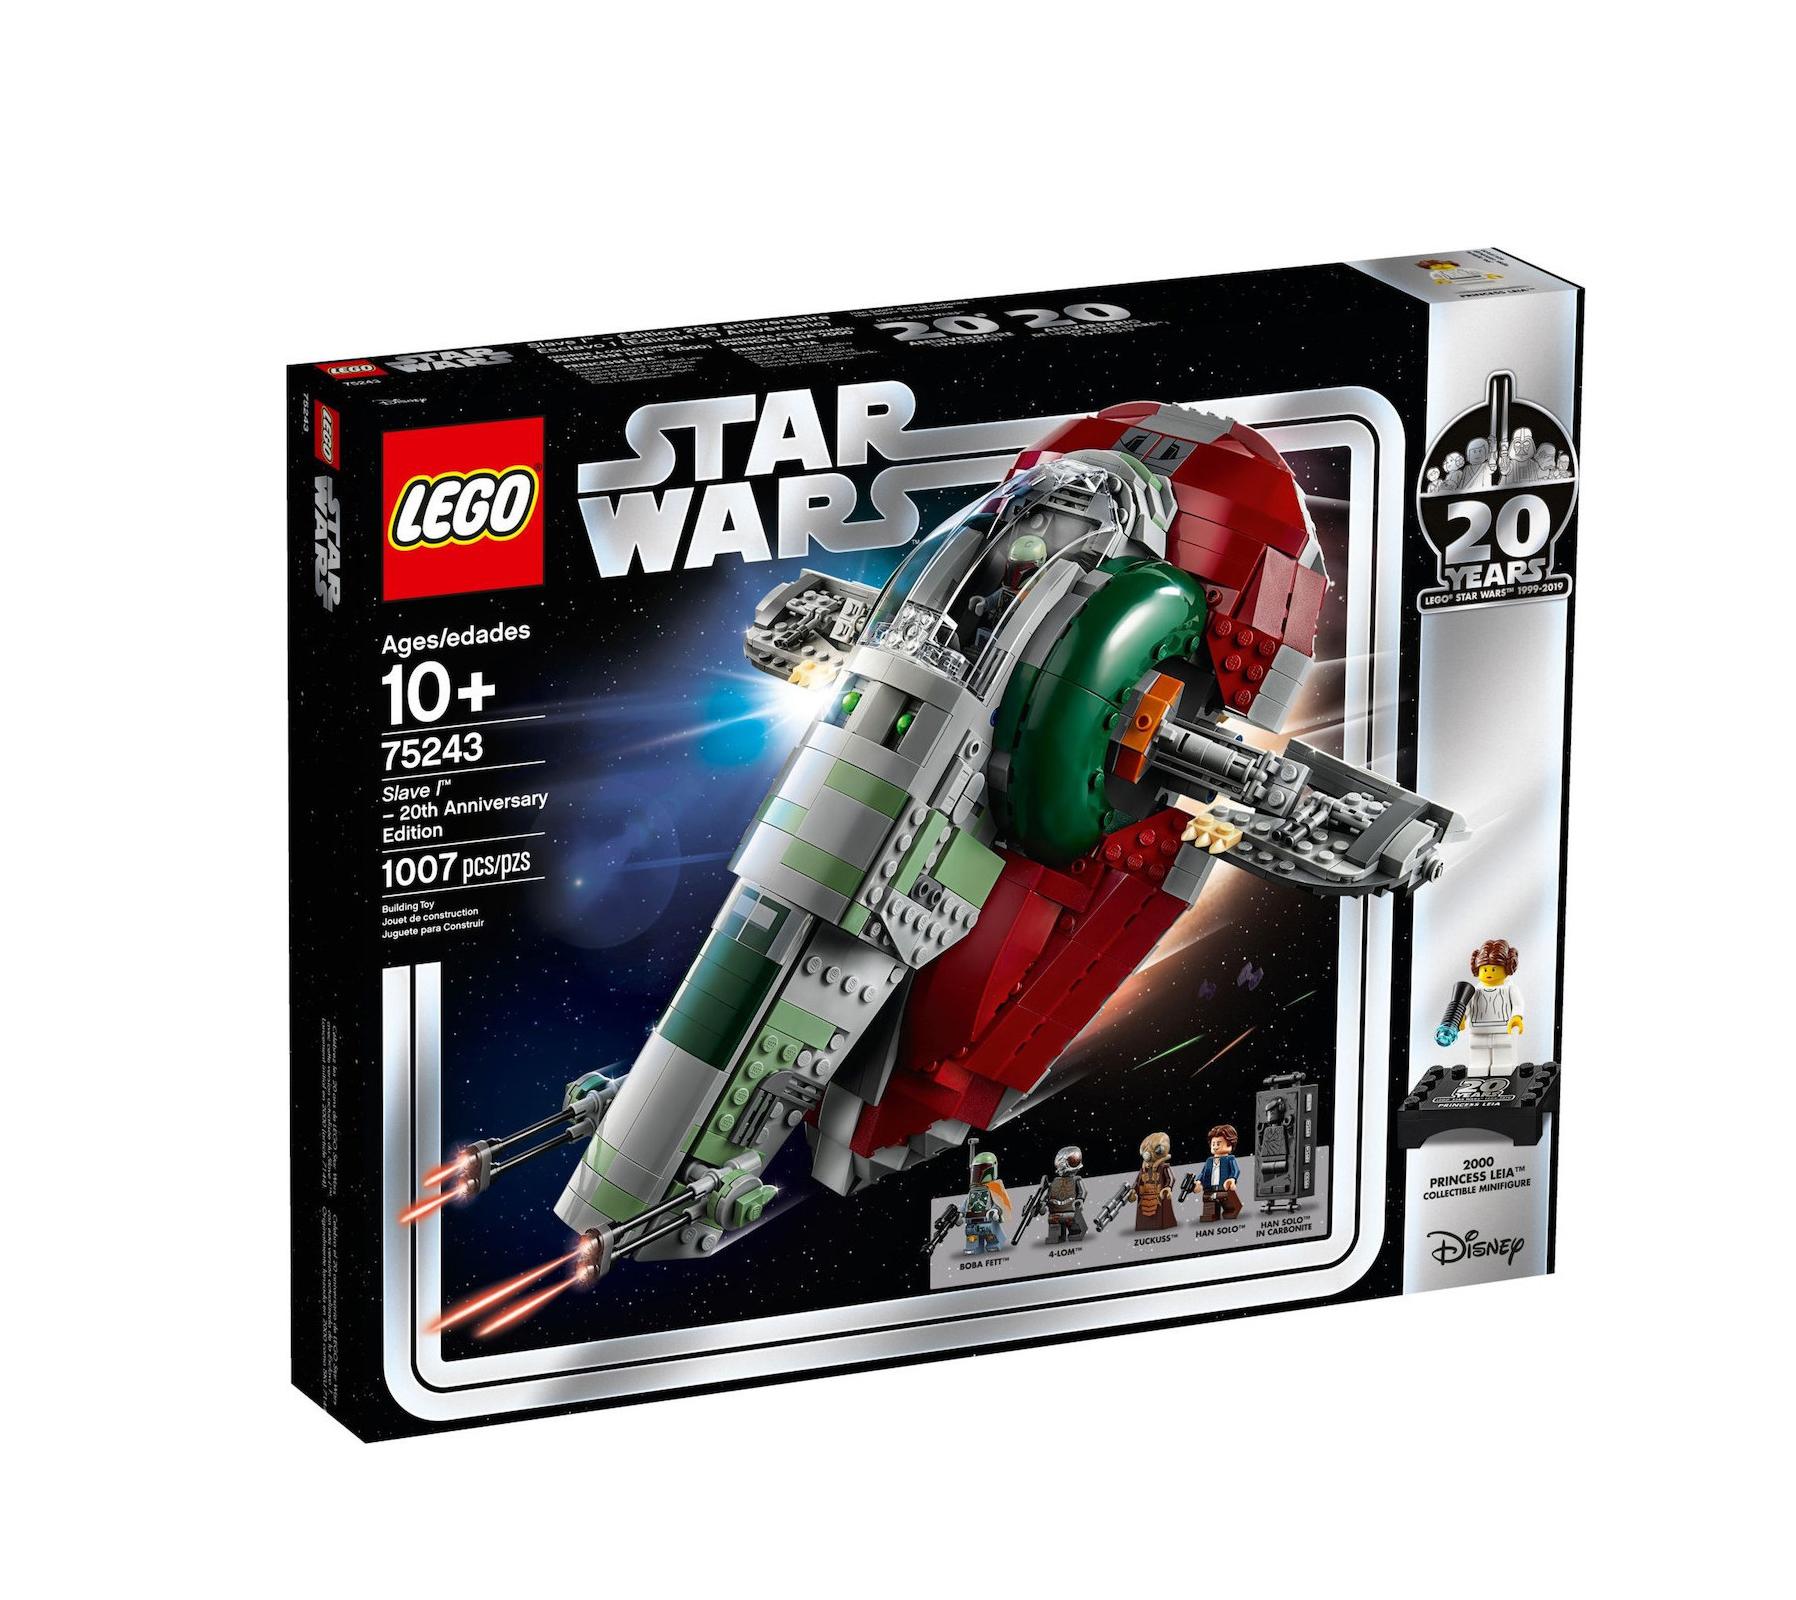 Lego Star Wars: Slave l 20th Anniversary Edition 75243